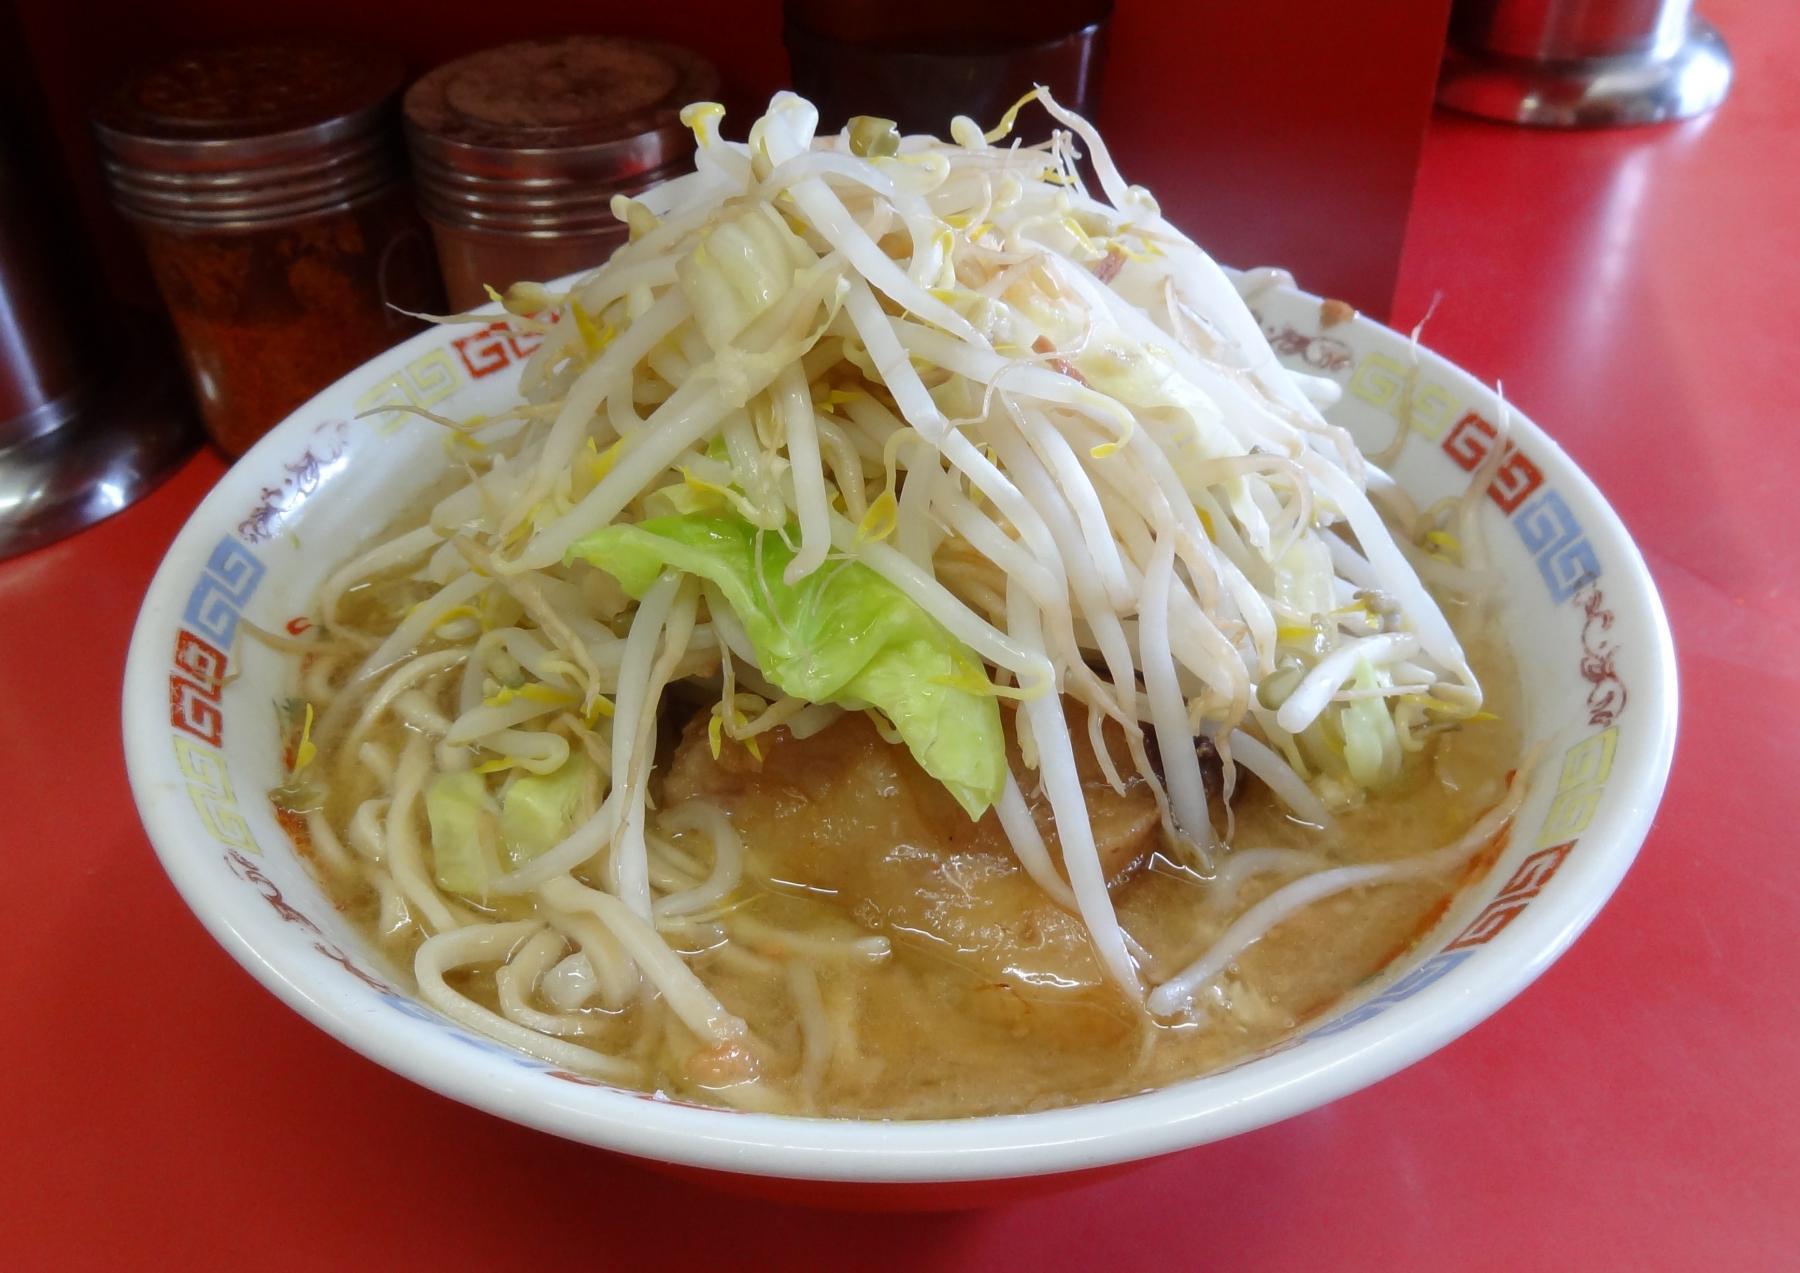 20120519002hibari.jpg